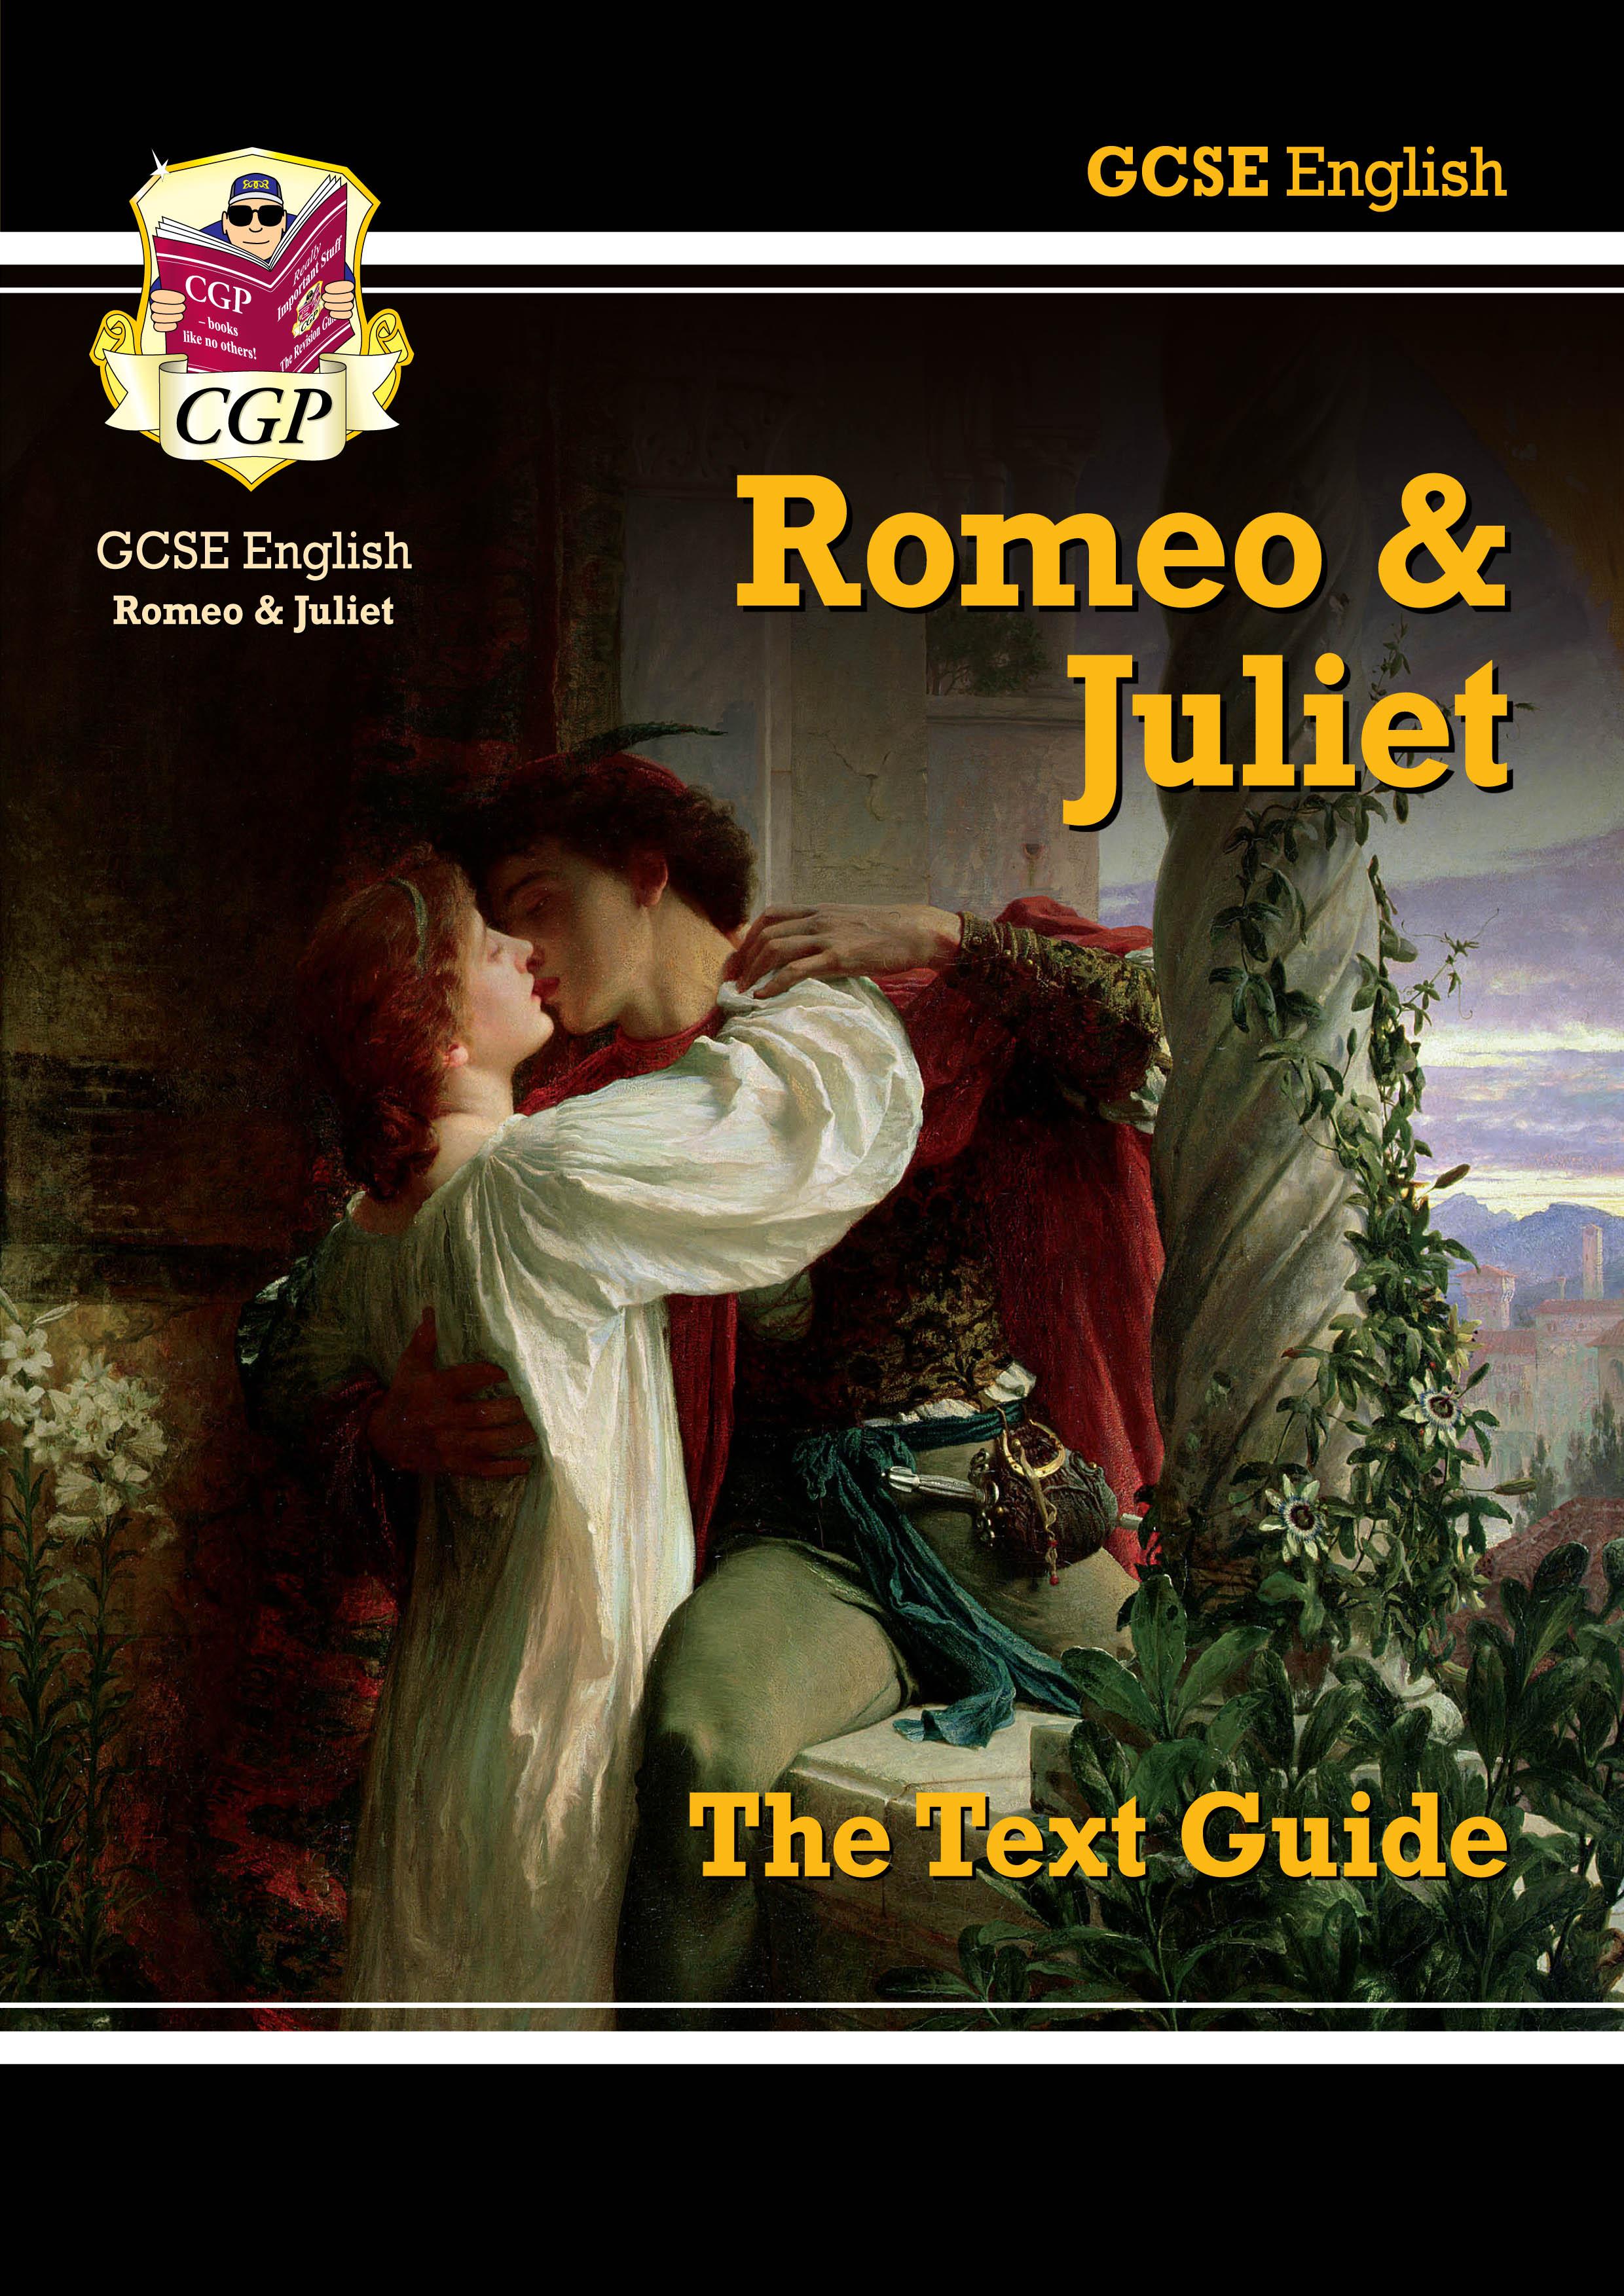 Grade 9-1 GCSE English Shakespeare Text Guide - Romeo